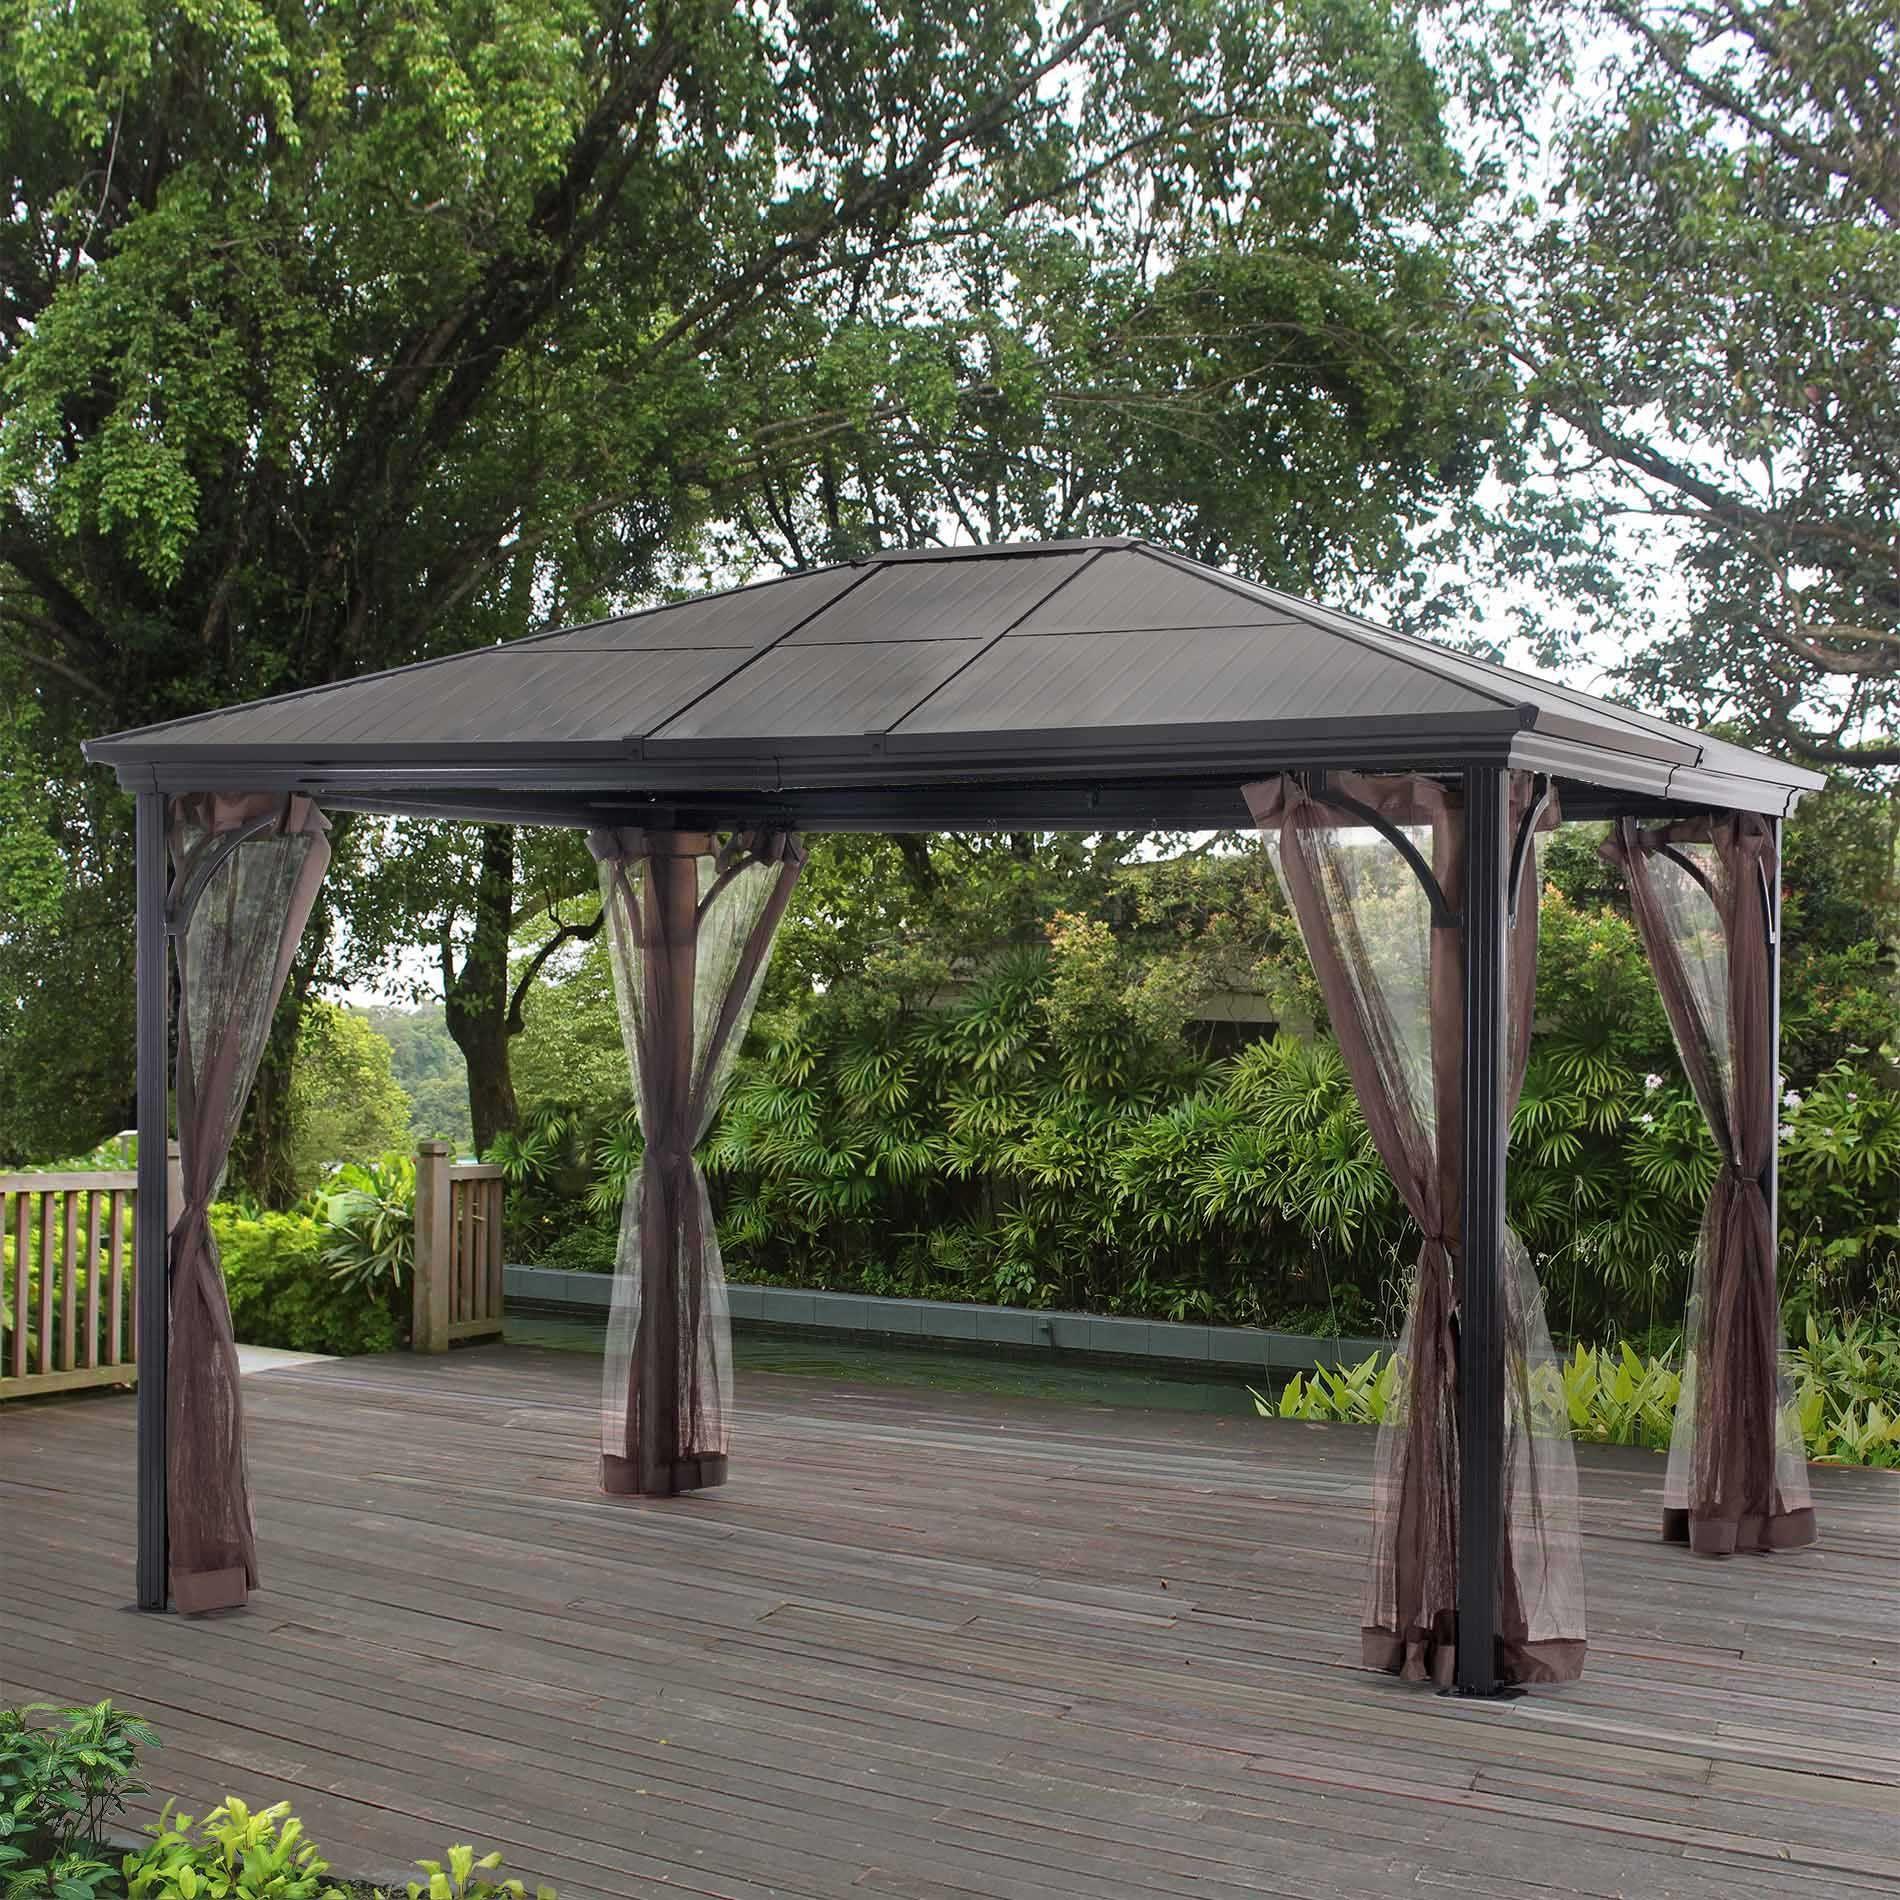 Grand Resort Sunland Park 10 X 12 Steel Roof Gazebo With Netting